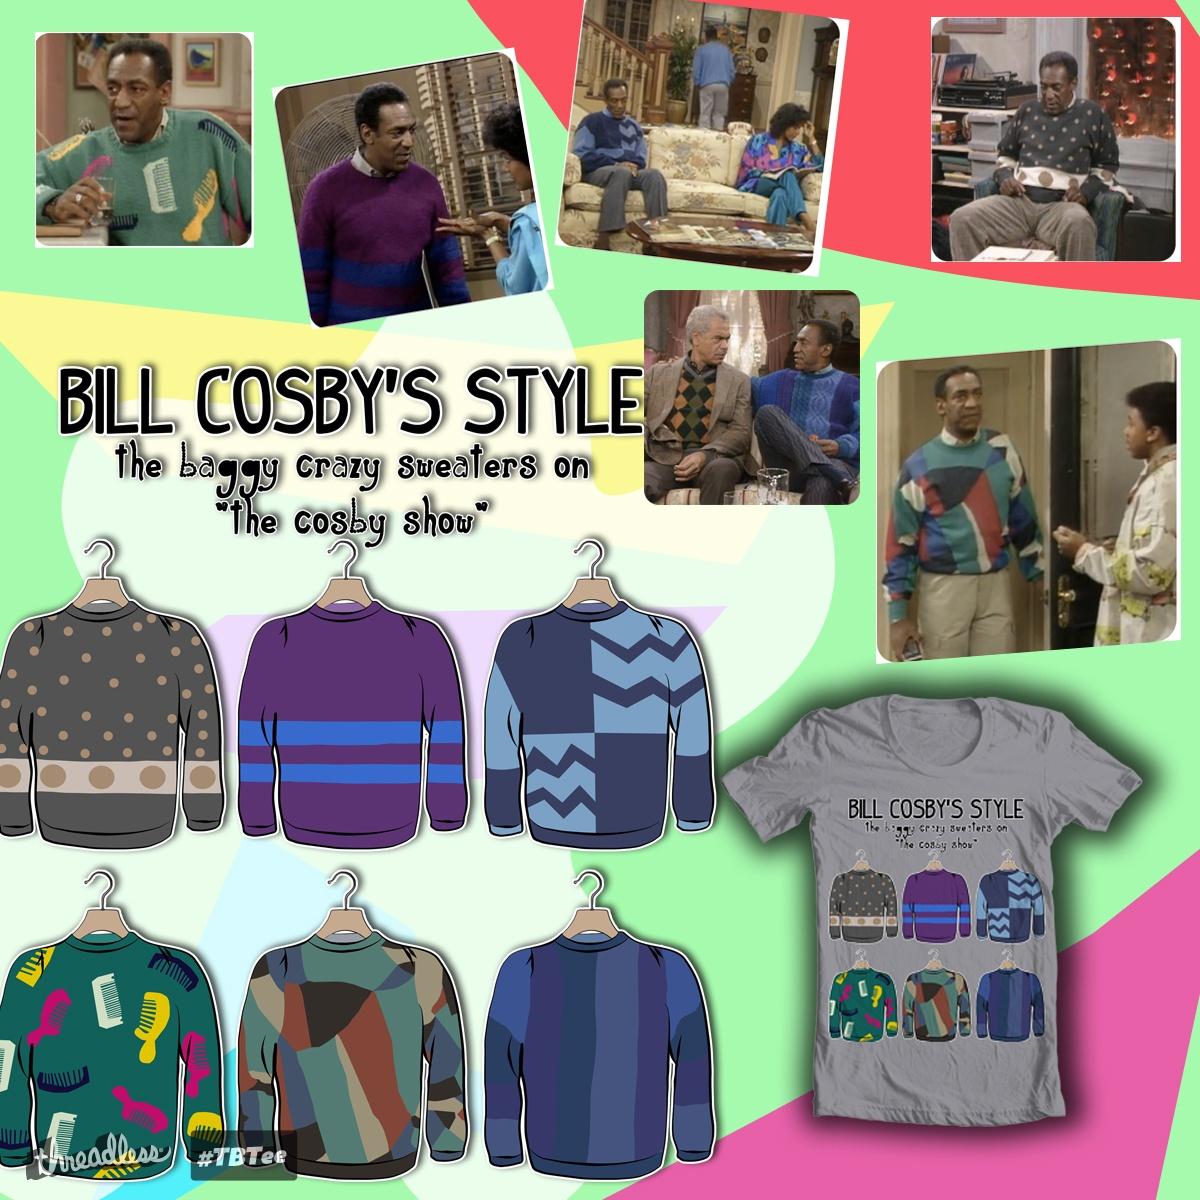 Score Bill Cosbys Sweaters By Asor77 On Threadless